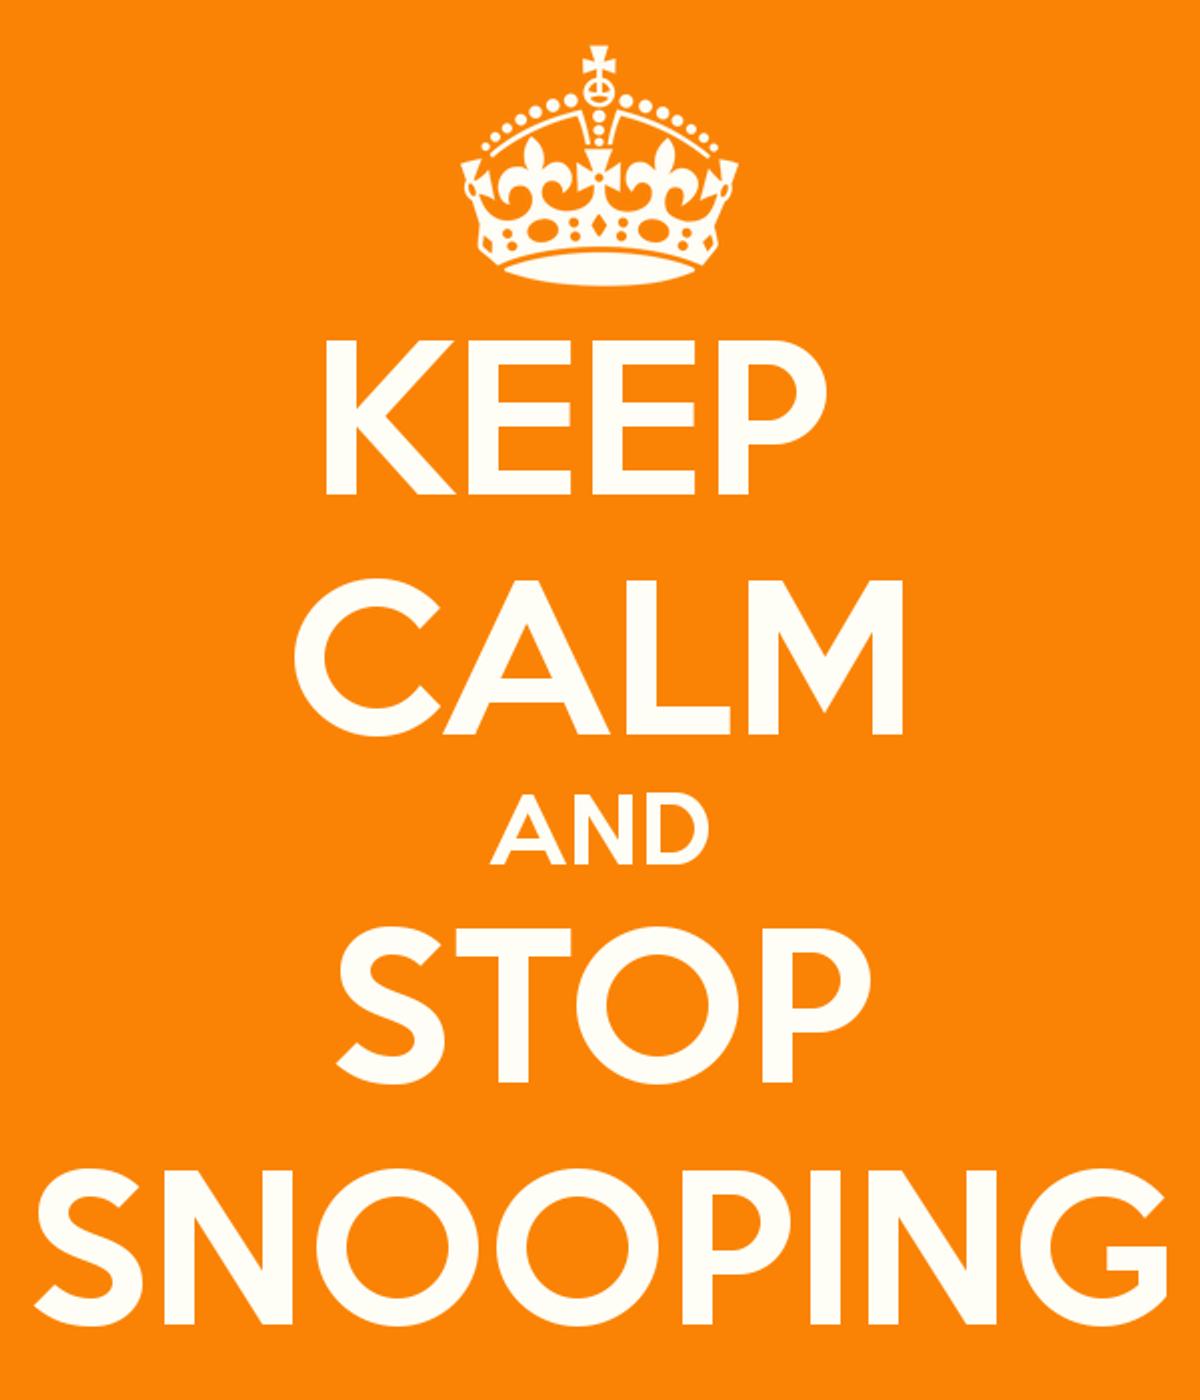 Why You Shouldn't Snoop